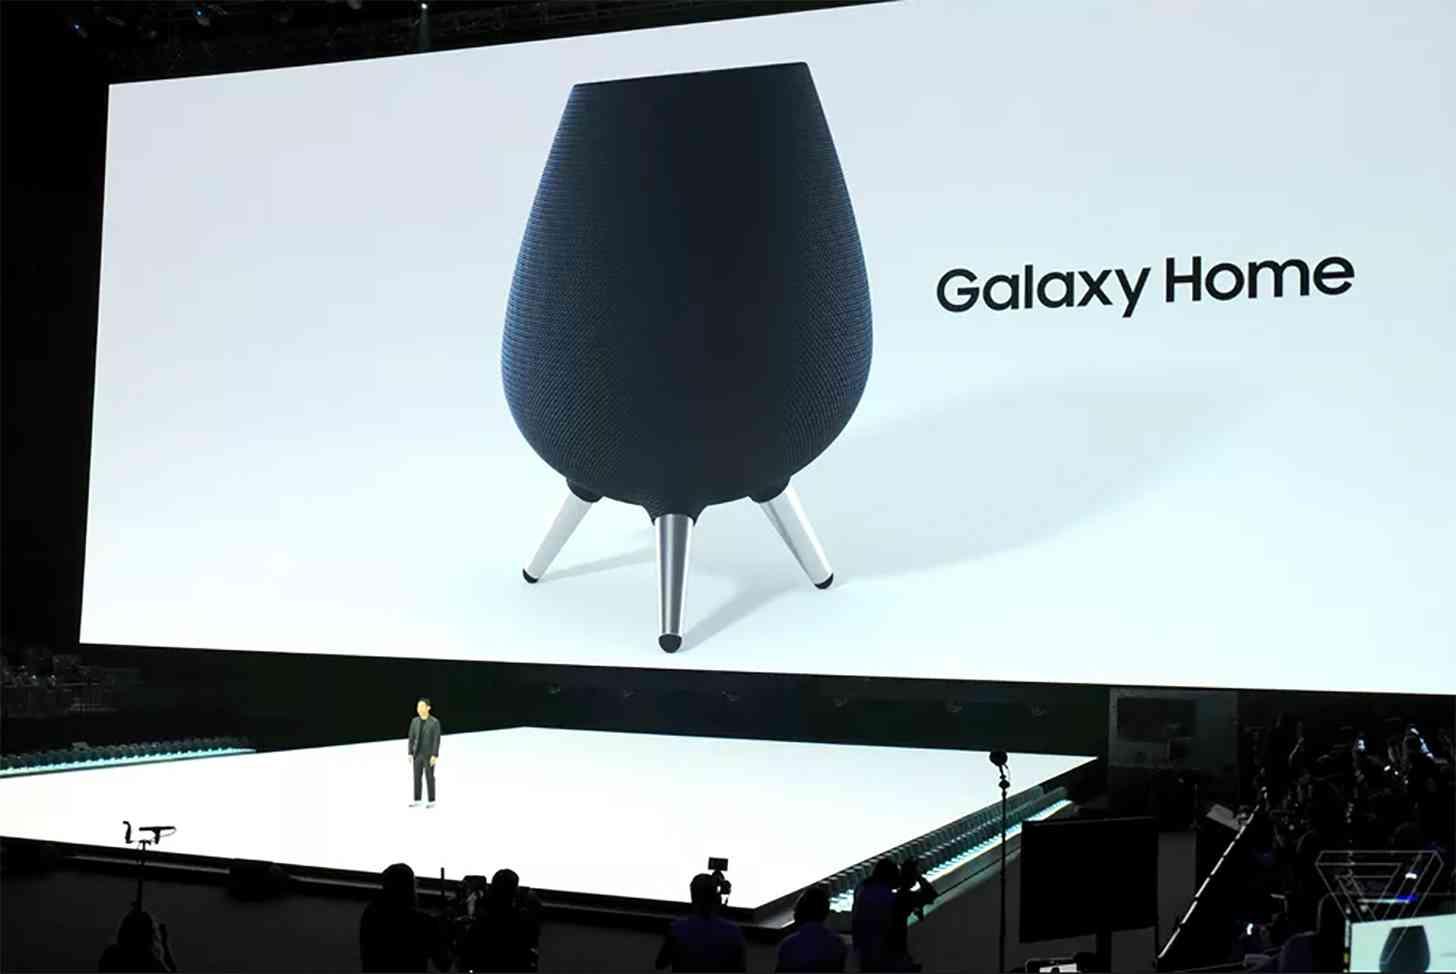 Samsung Galaxy Home Bixby smart speaker official